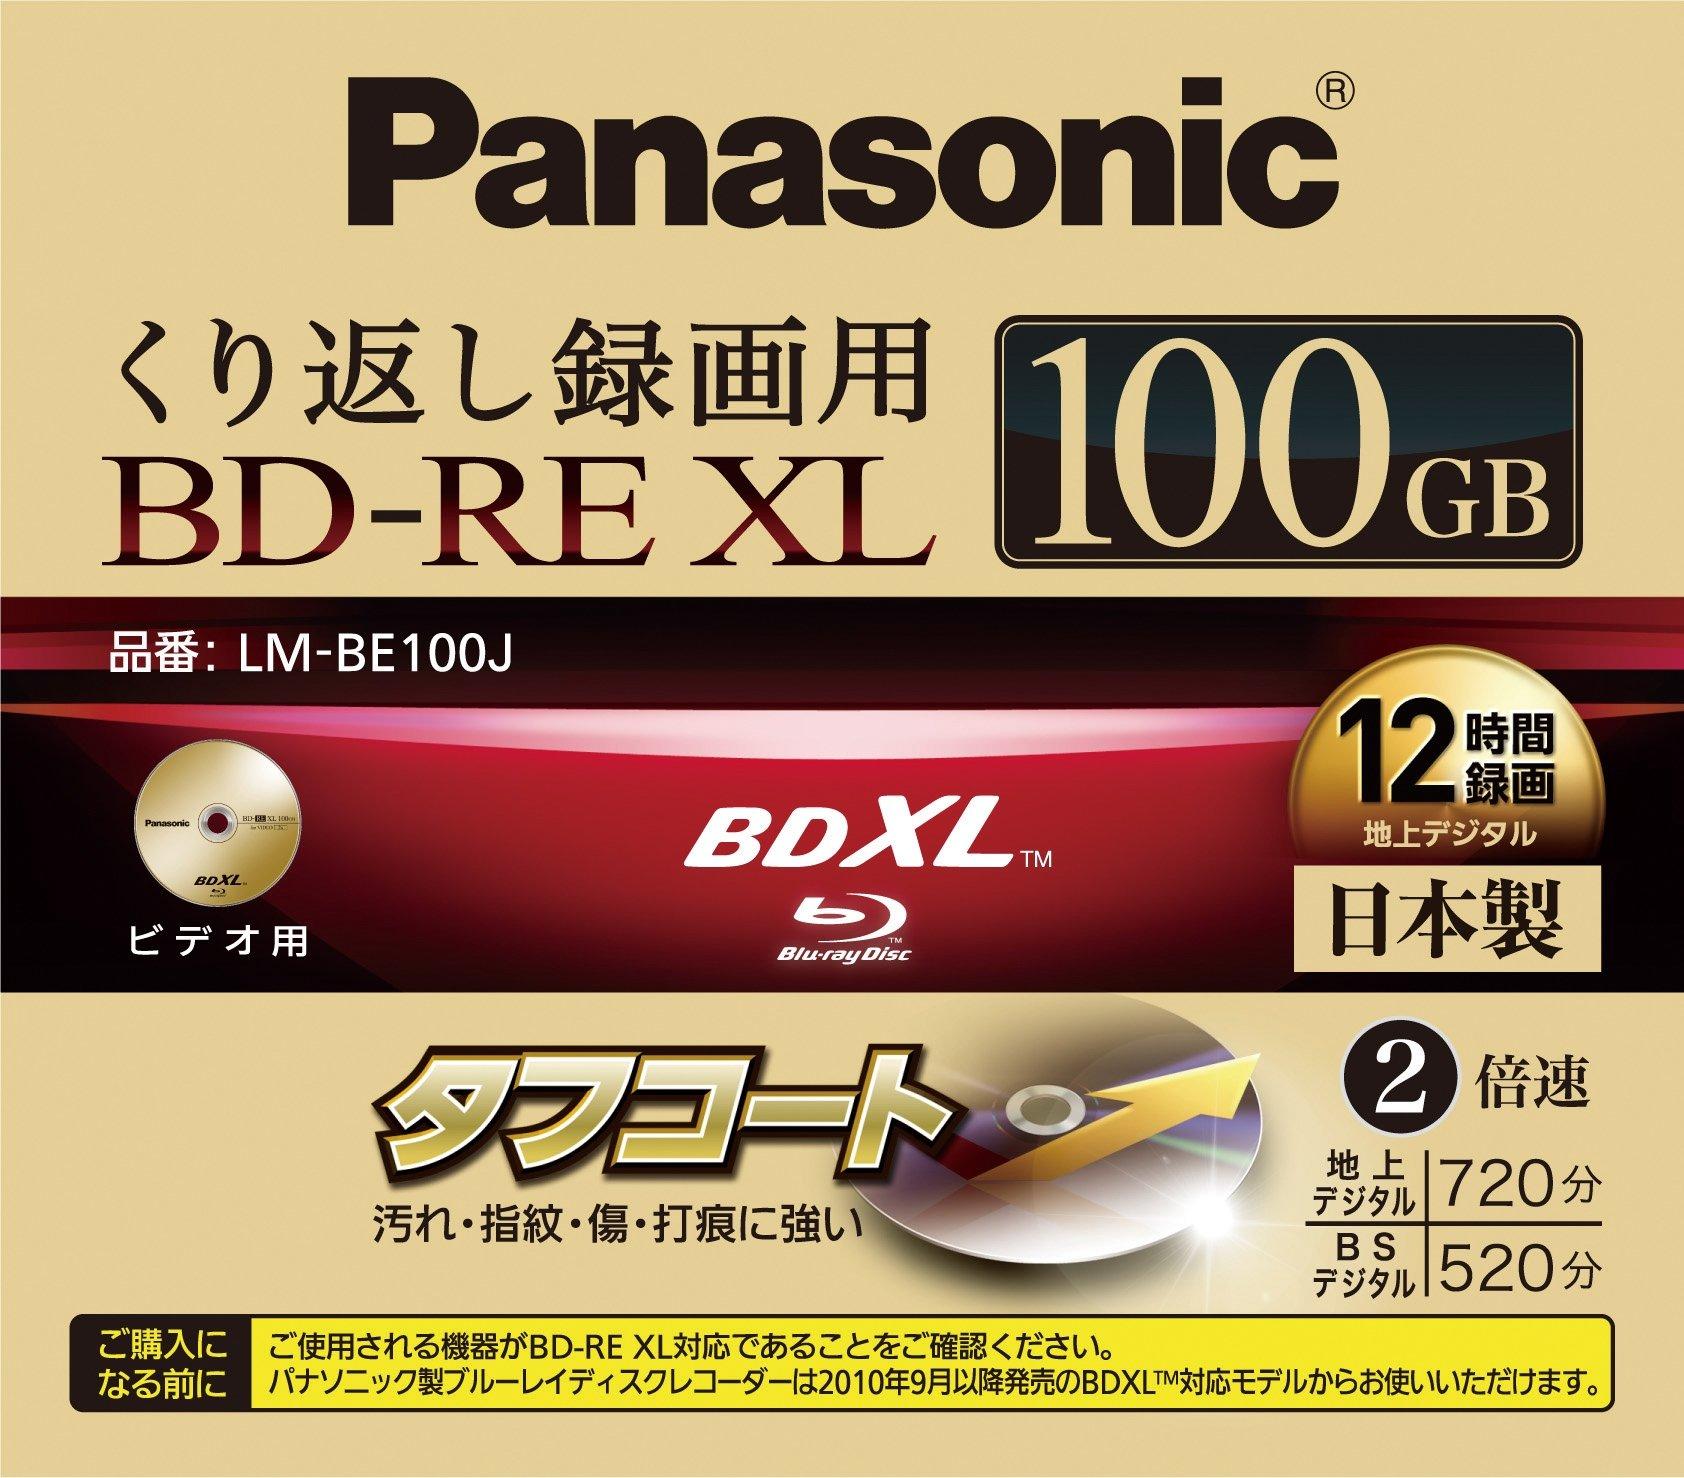 Panasonic Blu-ray BD-RE XL Rewritable BDXL Disk 100 GB 2x Speed Triple Layer Single Pack